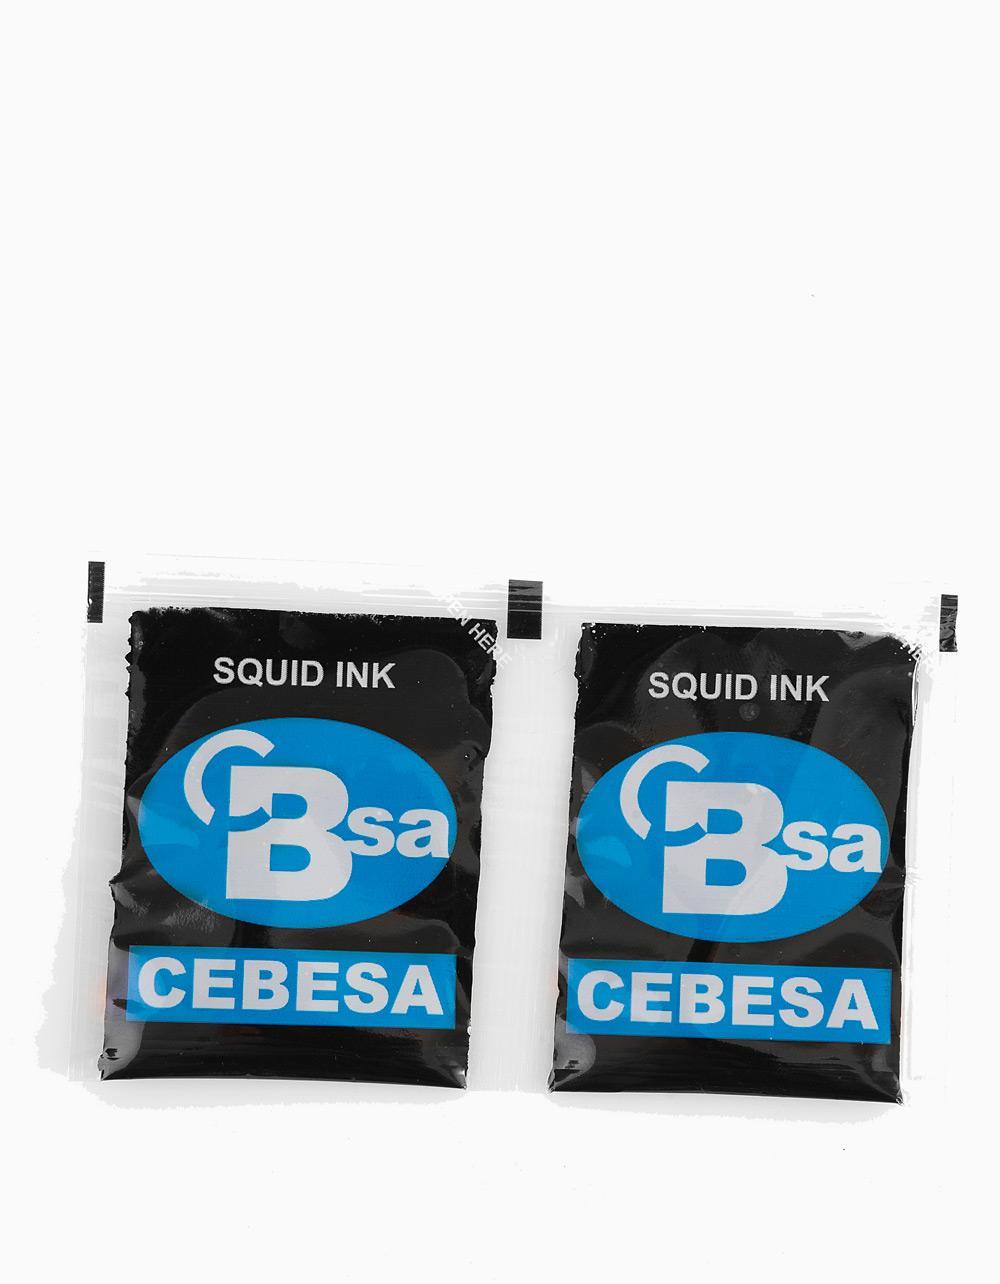 Cebesa Squid Ink Sachets 2 x 4g